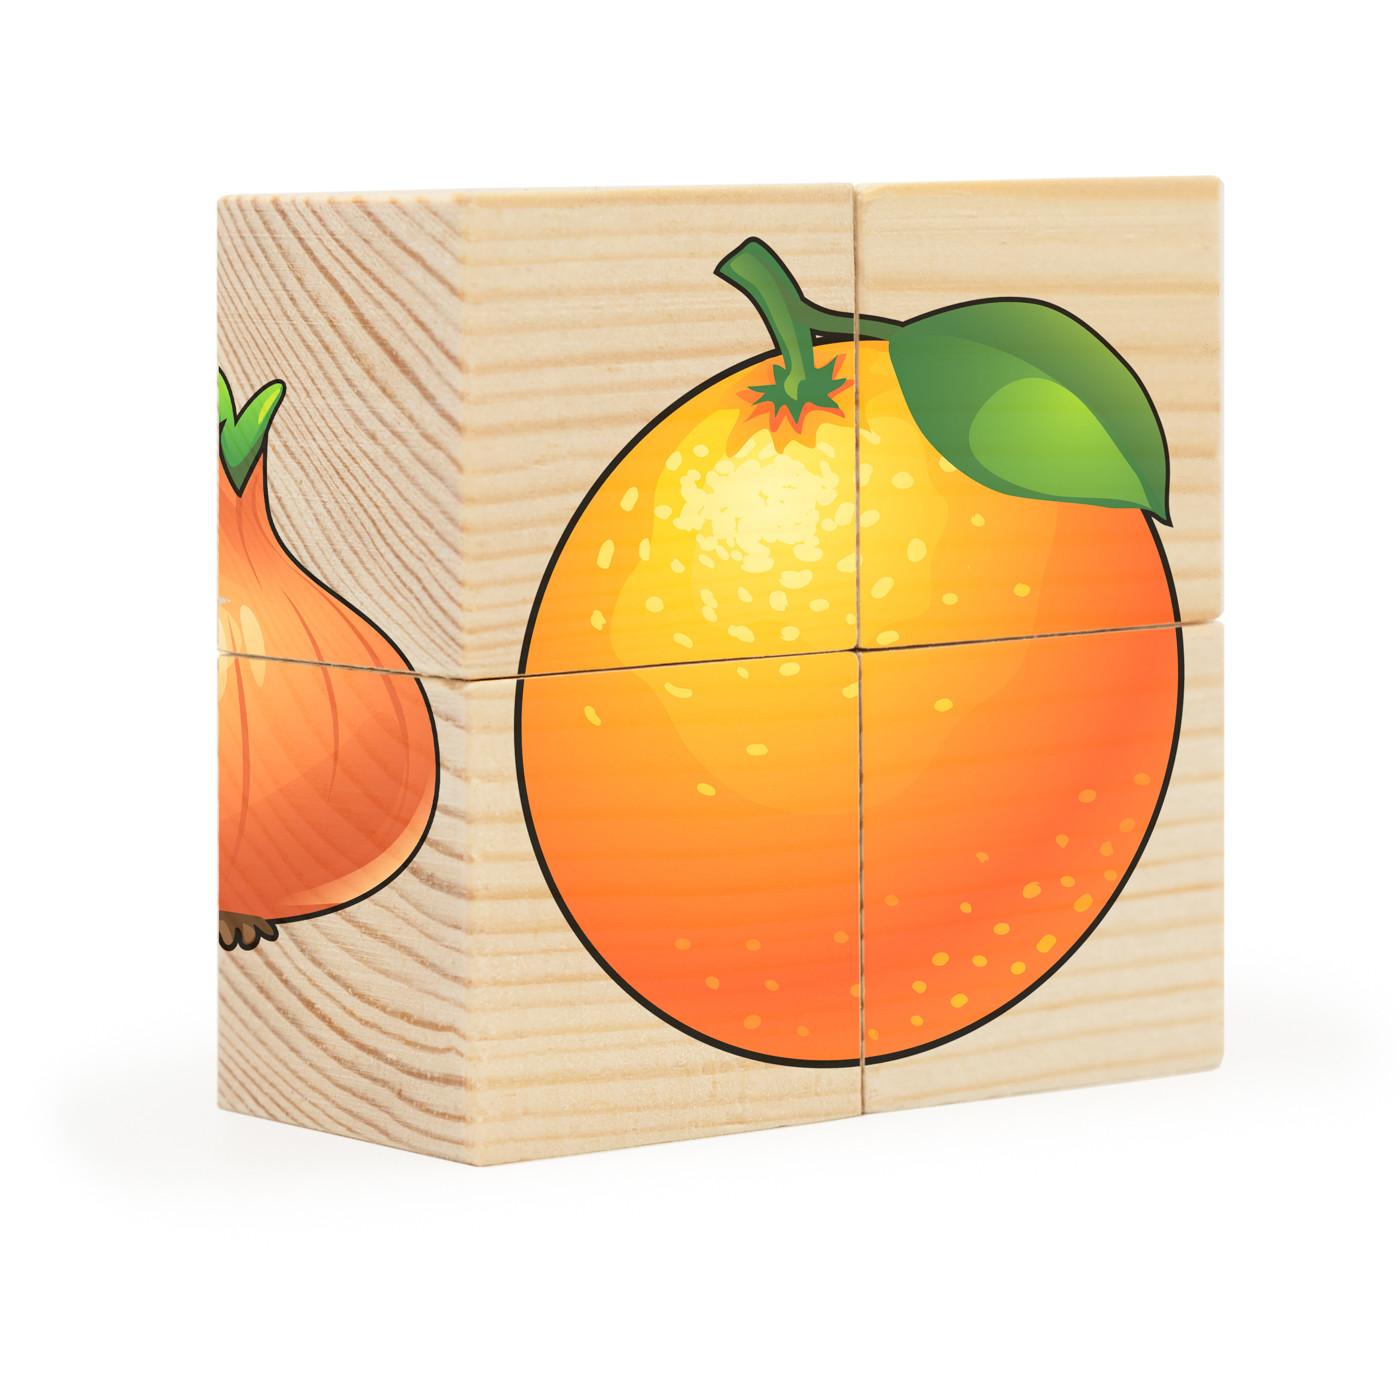 Фрукты-овощи. Собери рисунок. Кубики-пазл (4 кубика)